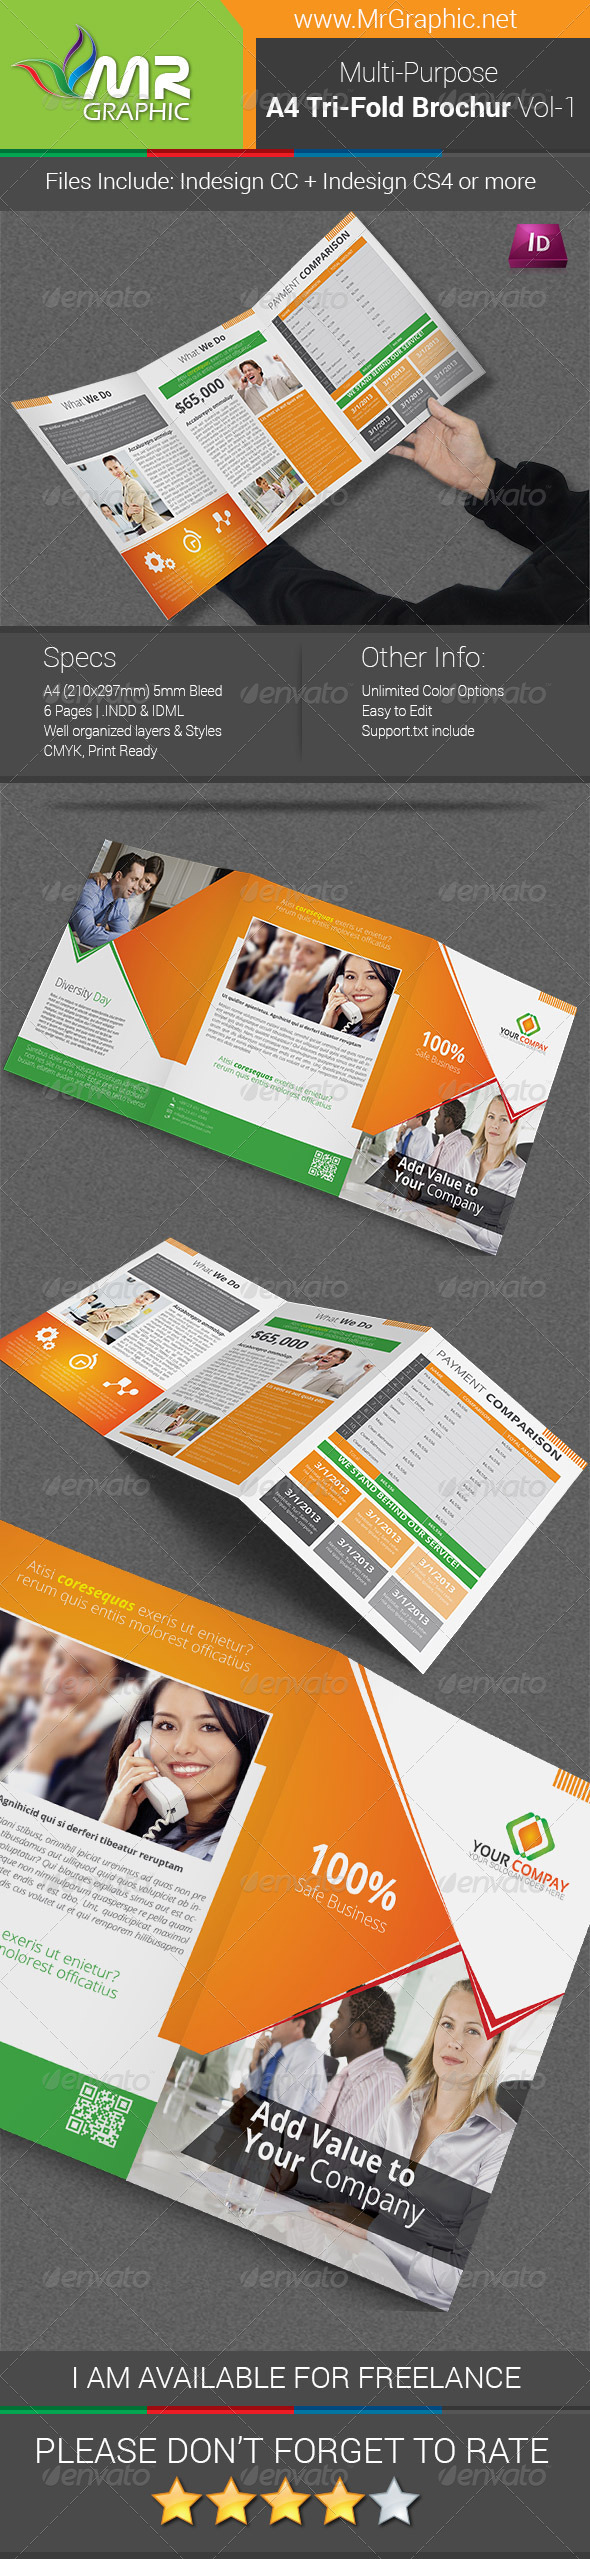 Multipurpose A4 Tri-Fold Brochure Template Vol-1 - Corporate Brochures